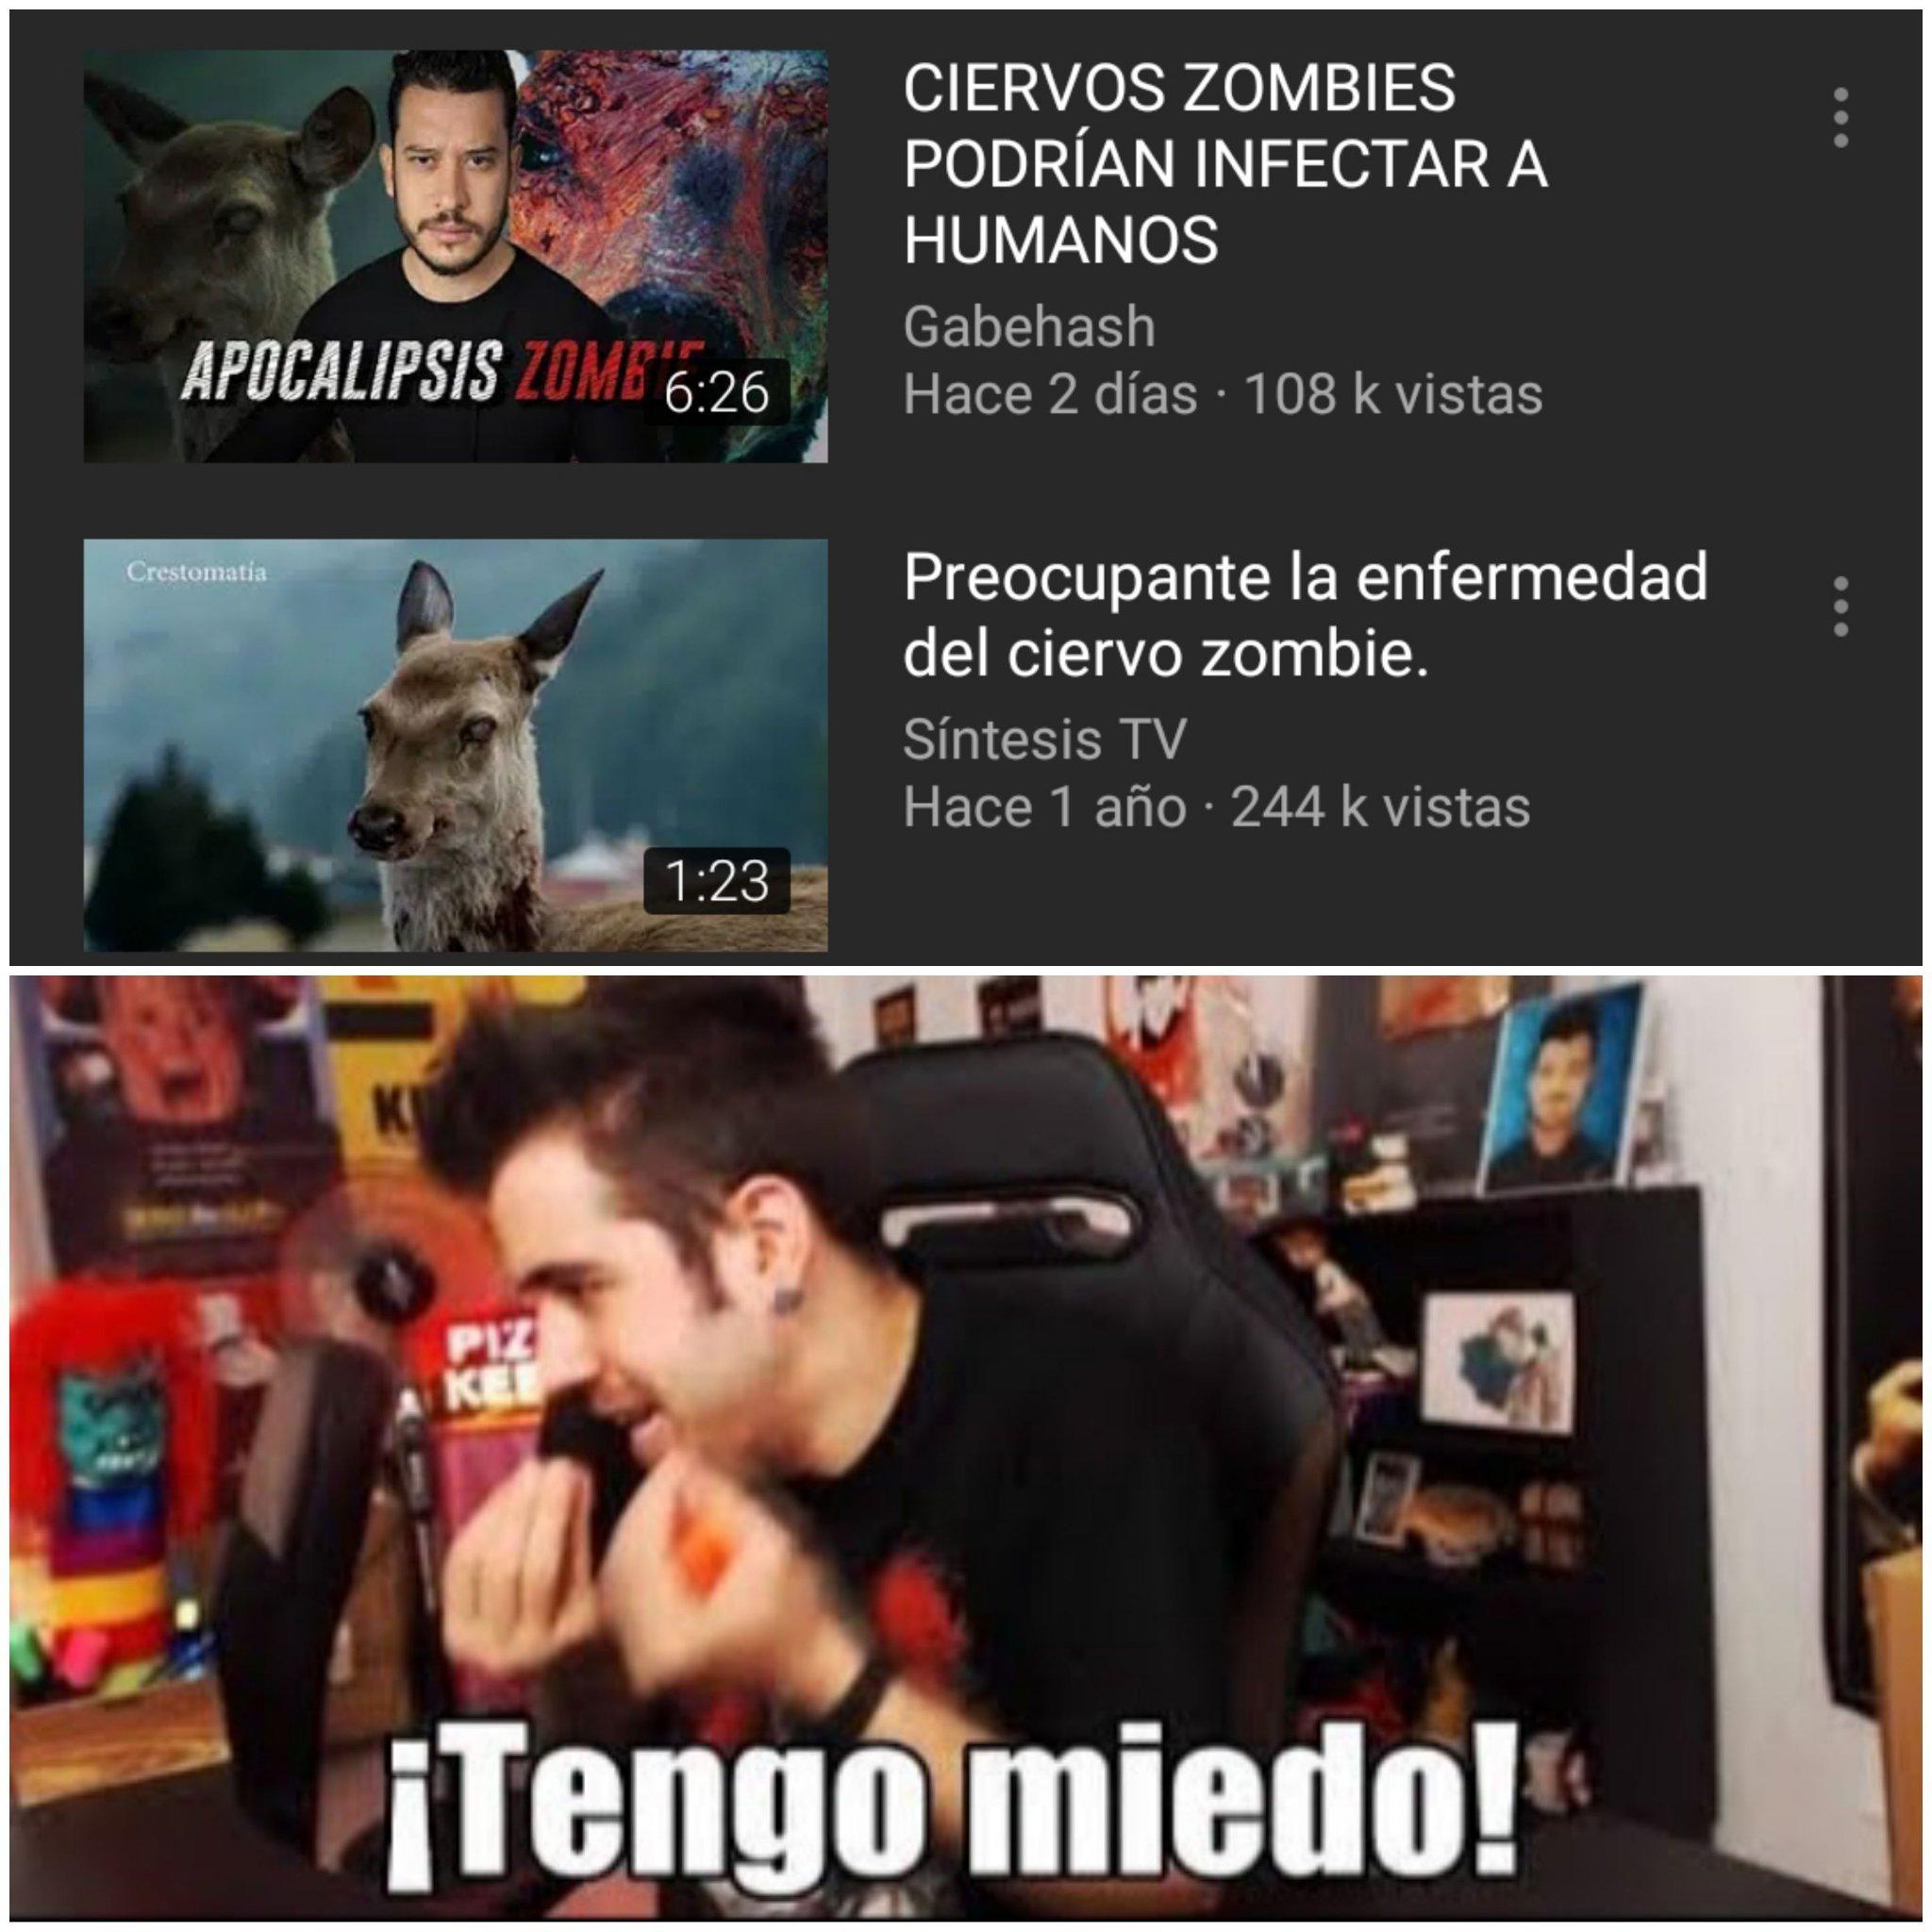 Igualito a un peli de zombies - meme